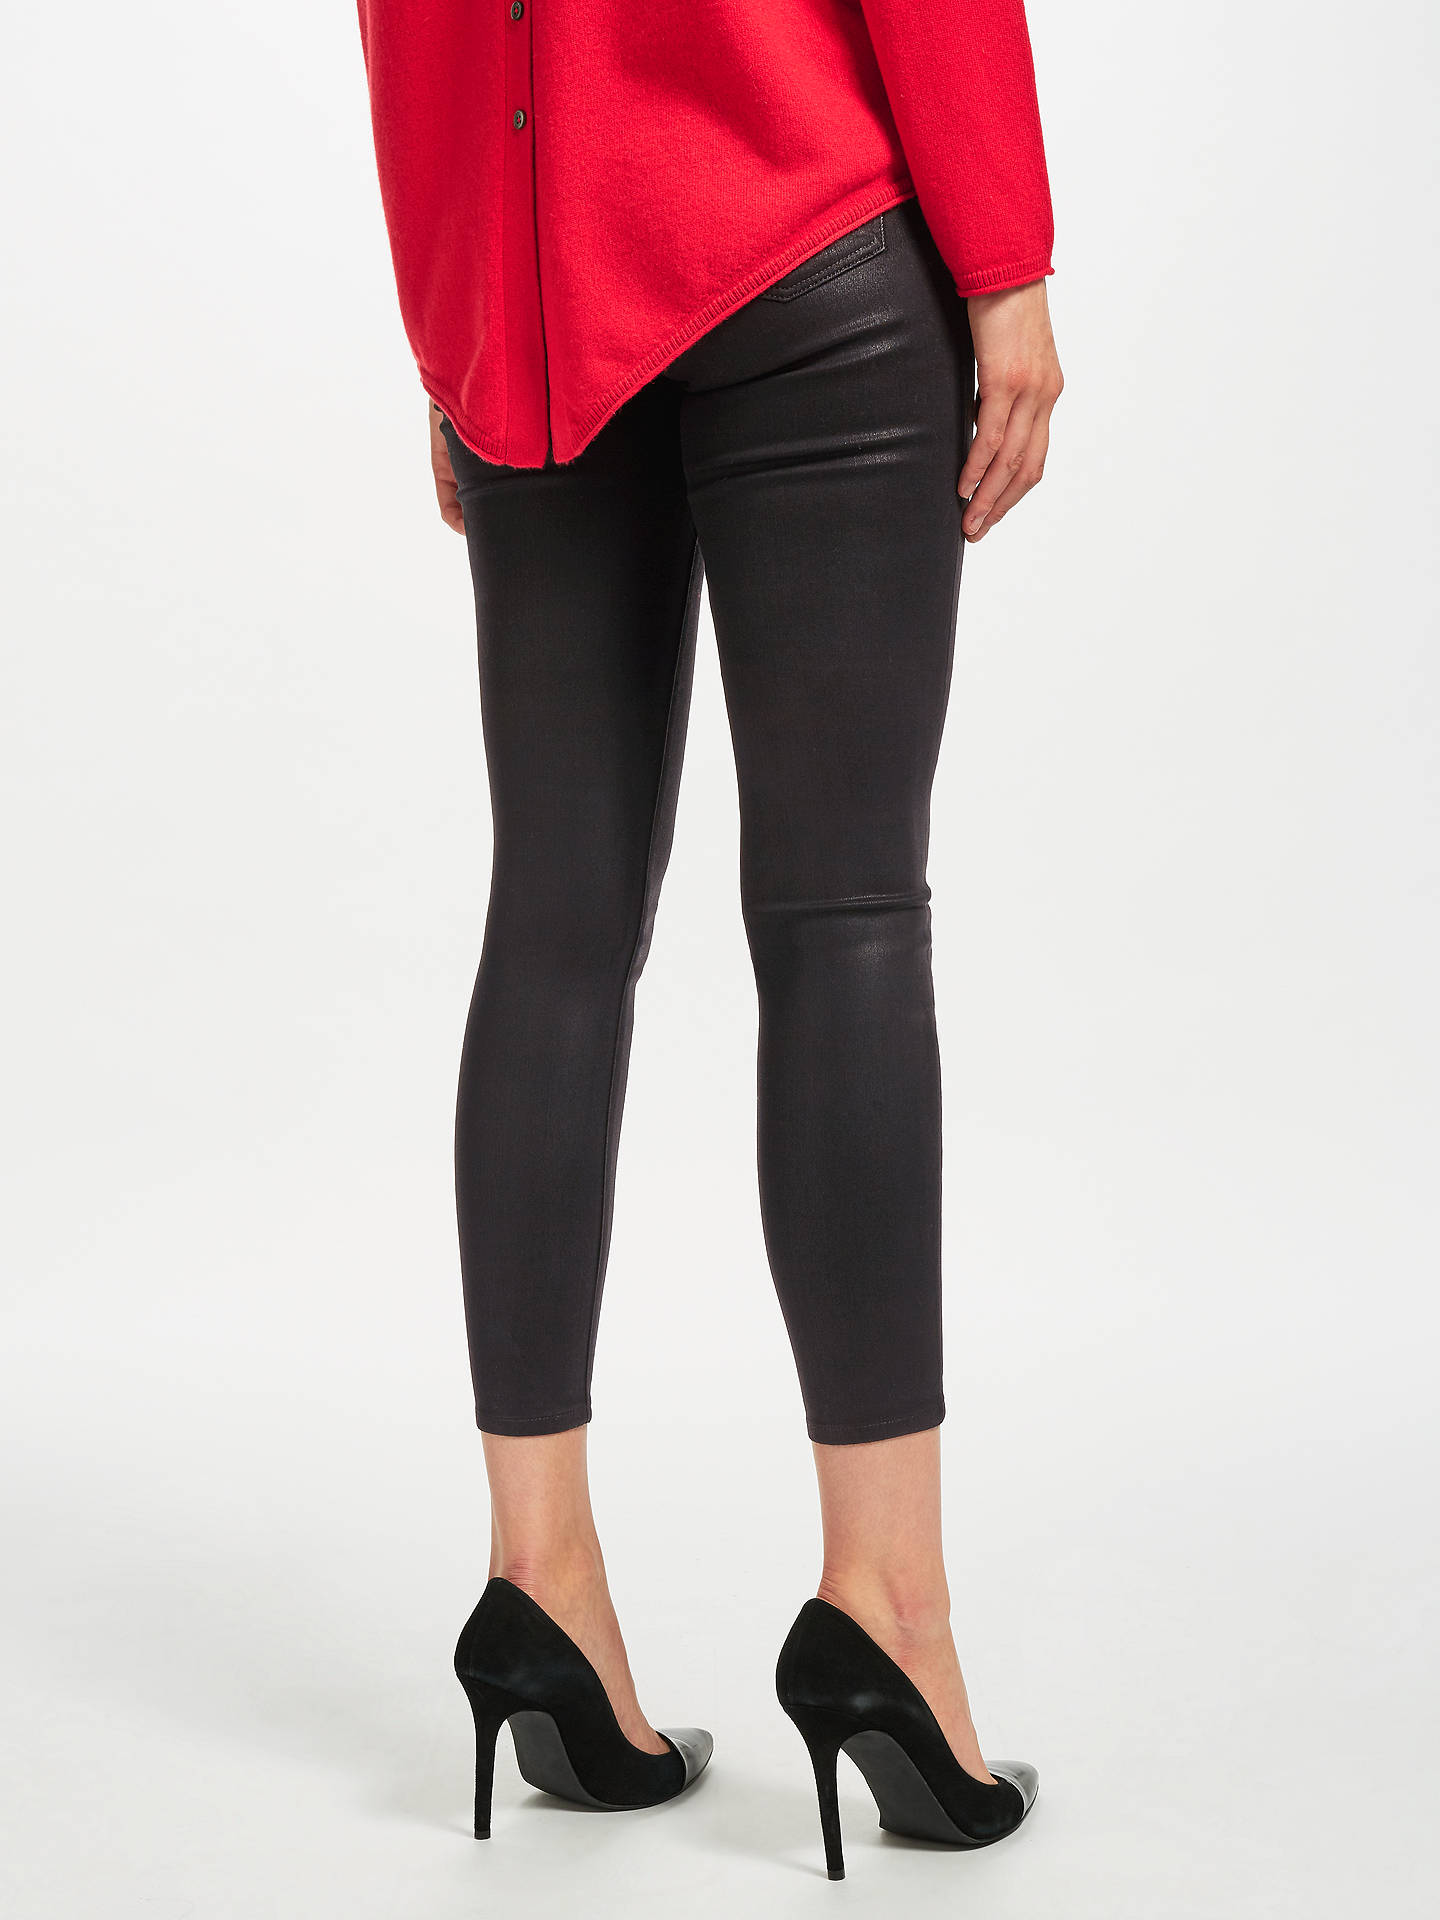 70927c1d7aa8 ... Buy J Brand Alana High Rise Cropped Skinny Jeans